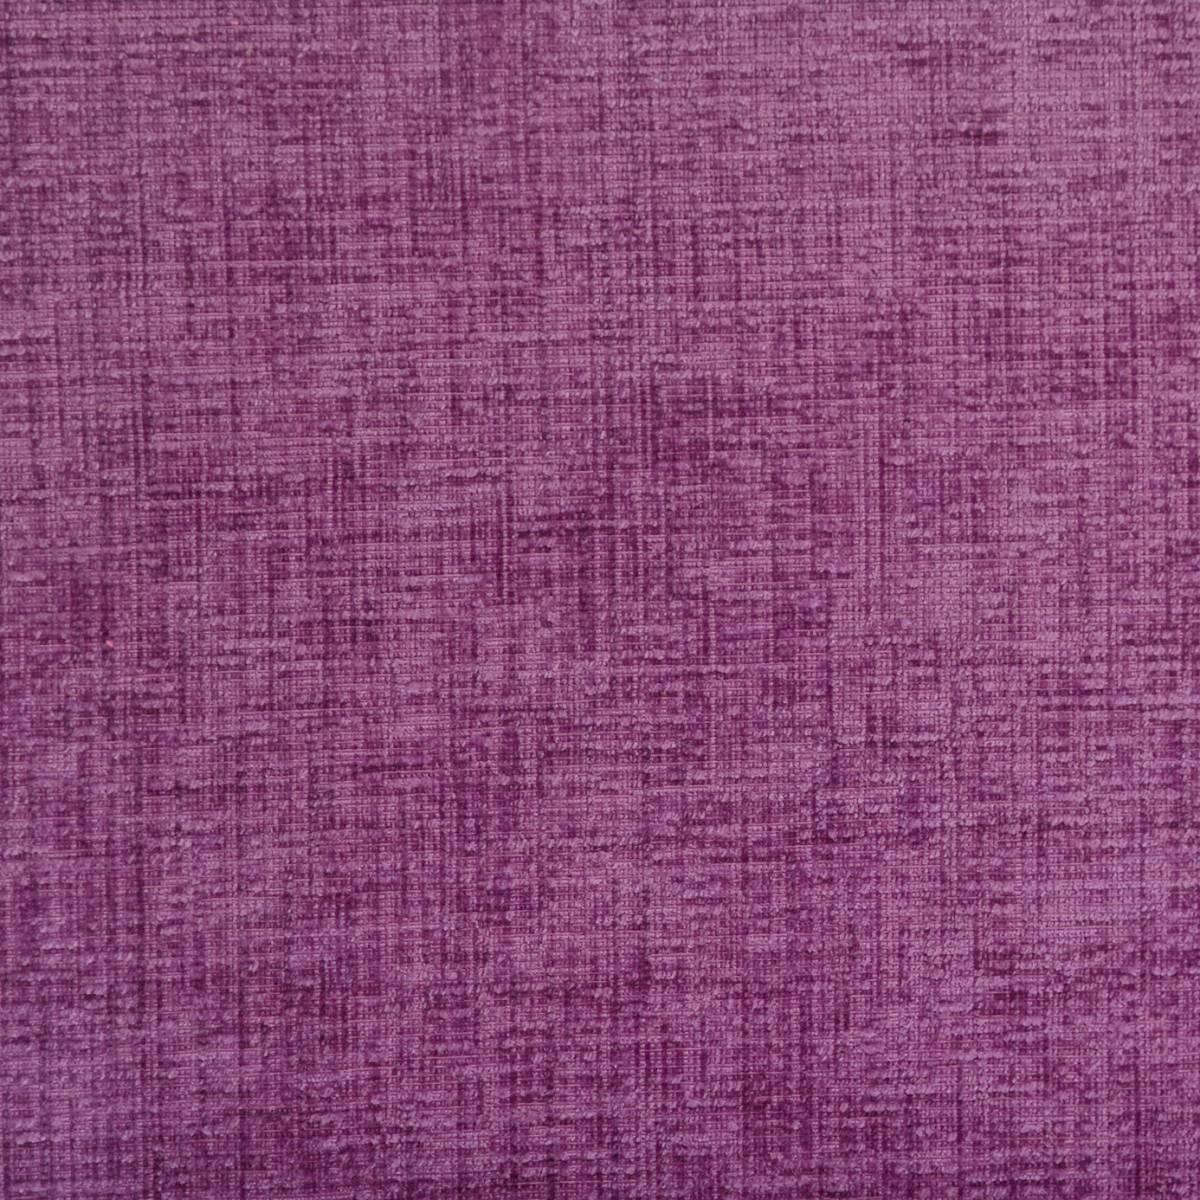 Prestigious Textiles Zephyr Fabric - Lavender Product Code: 7110/805